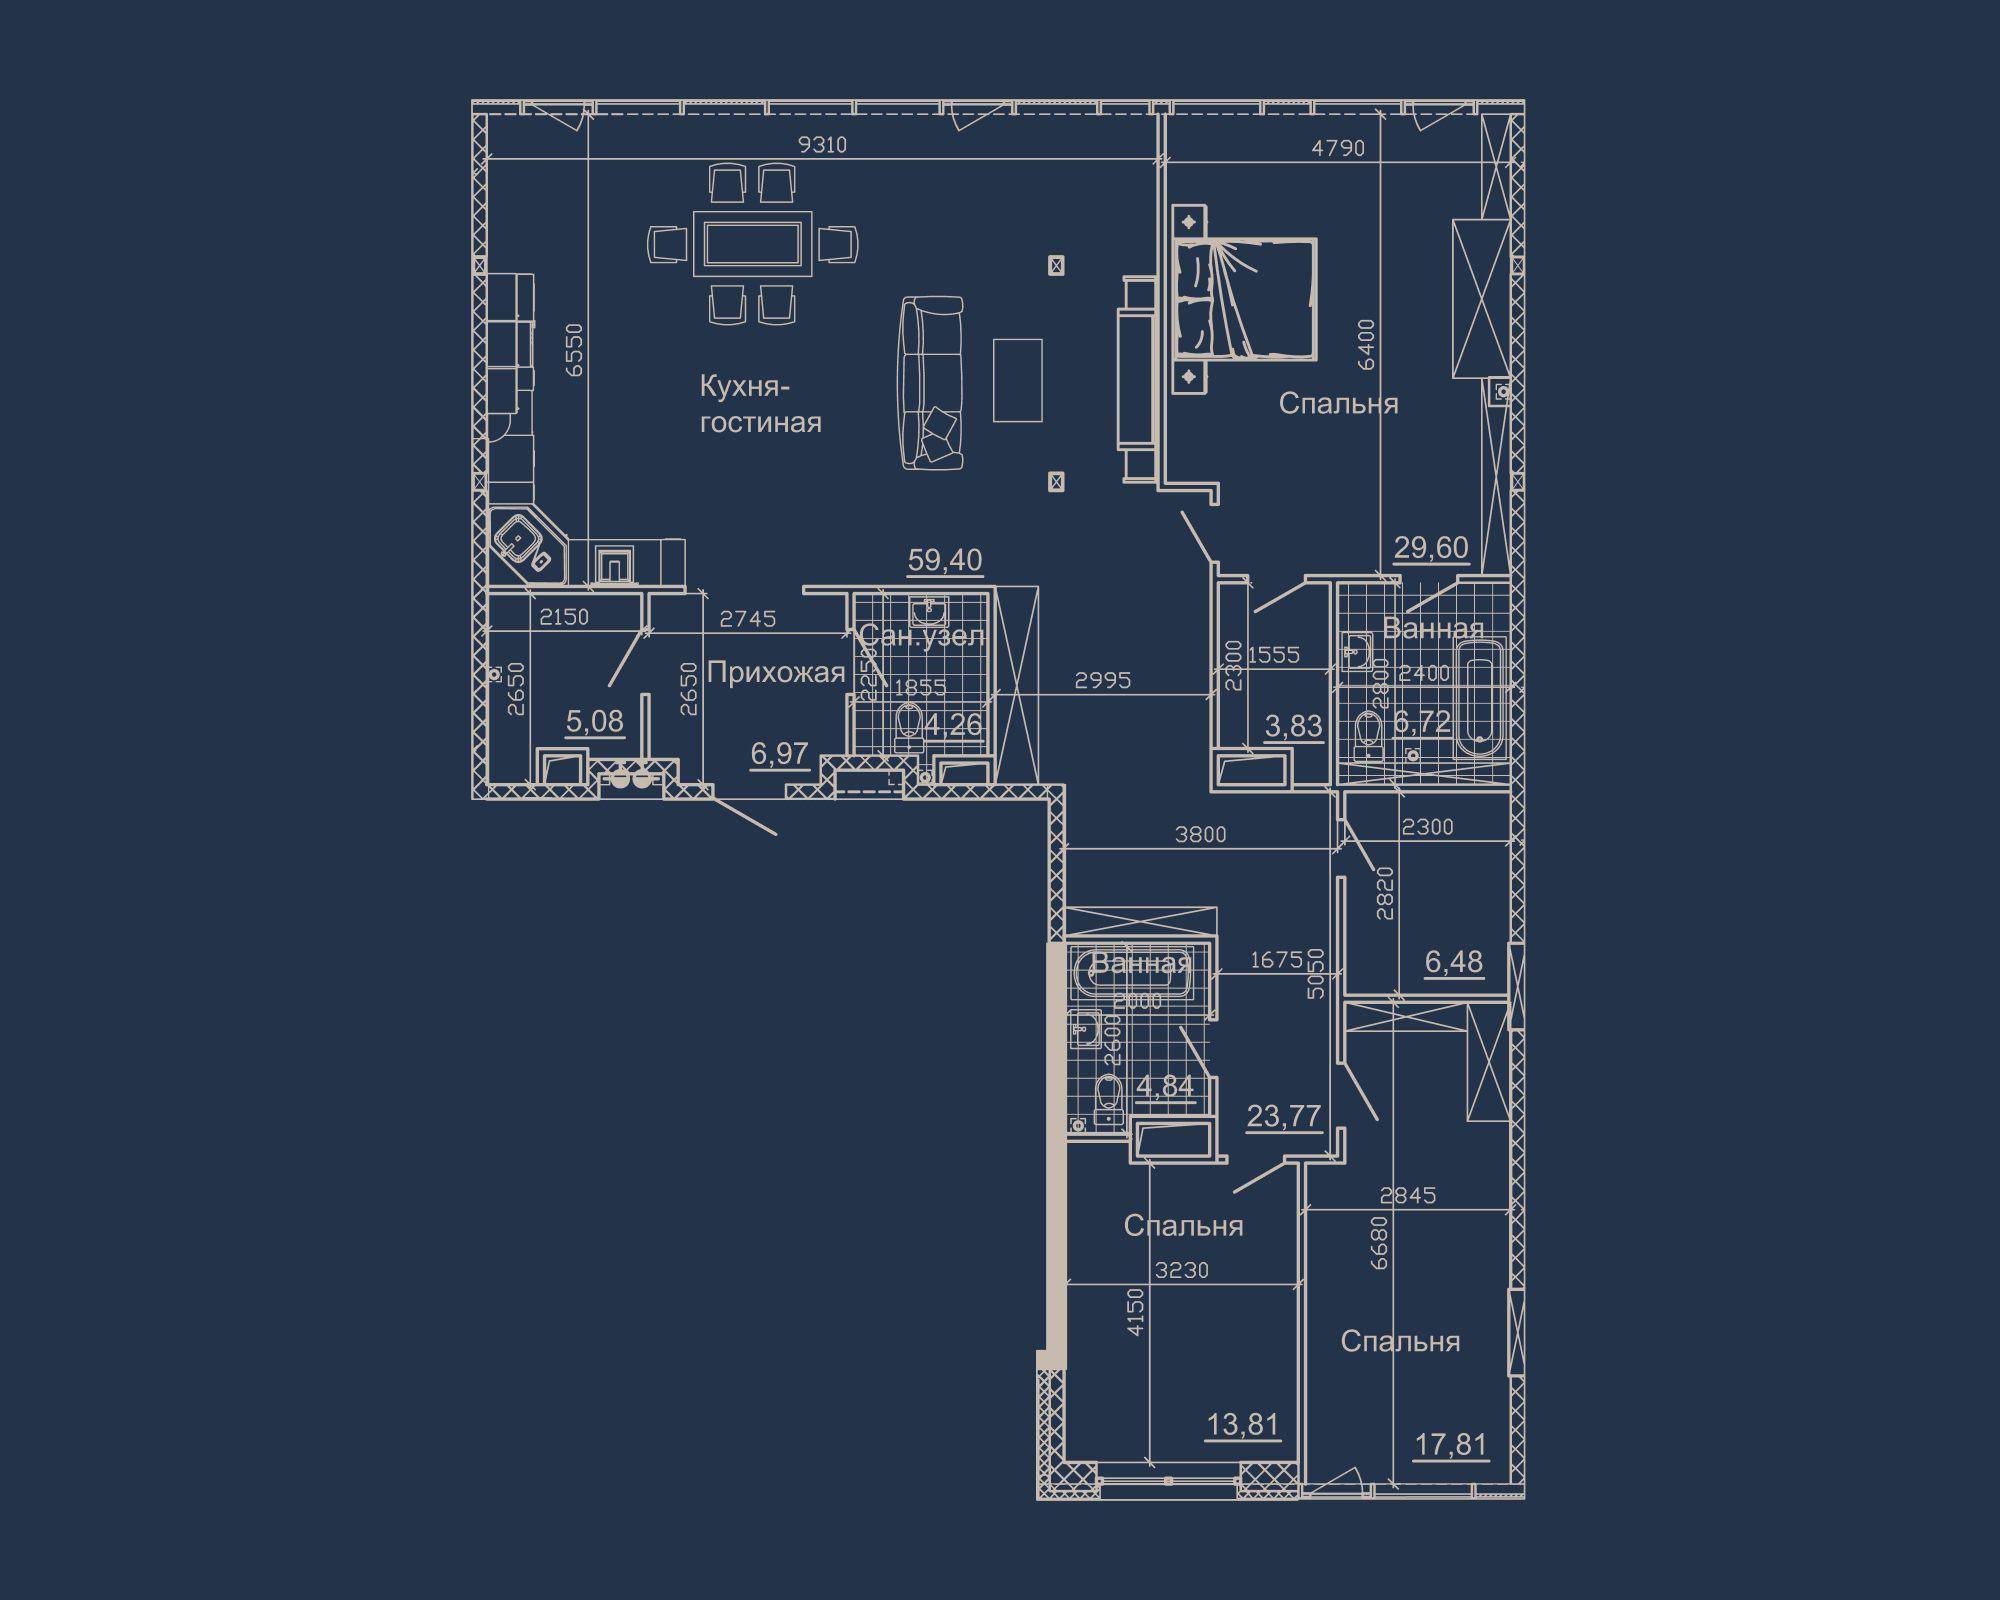 3-кімнатна квартира типу 16А-2 у ЖК Nebo